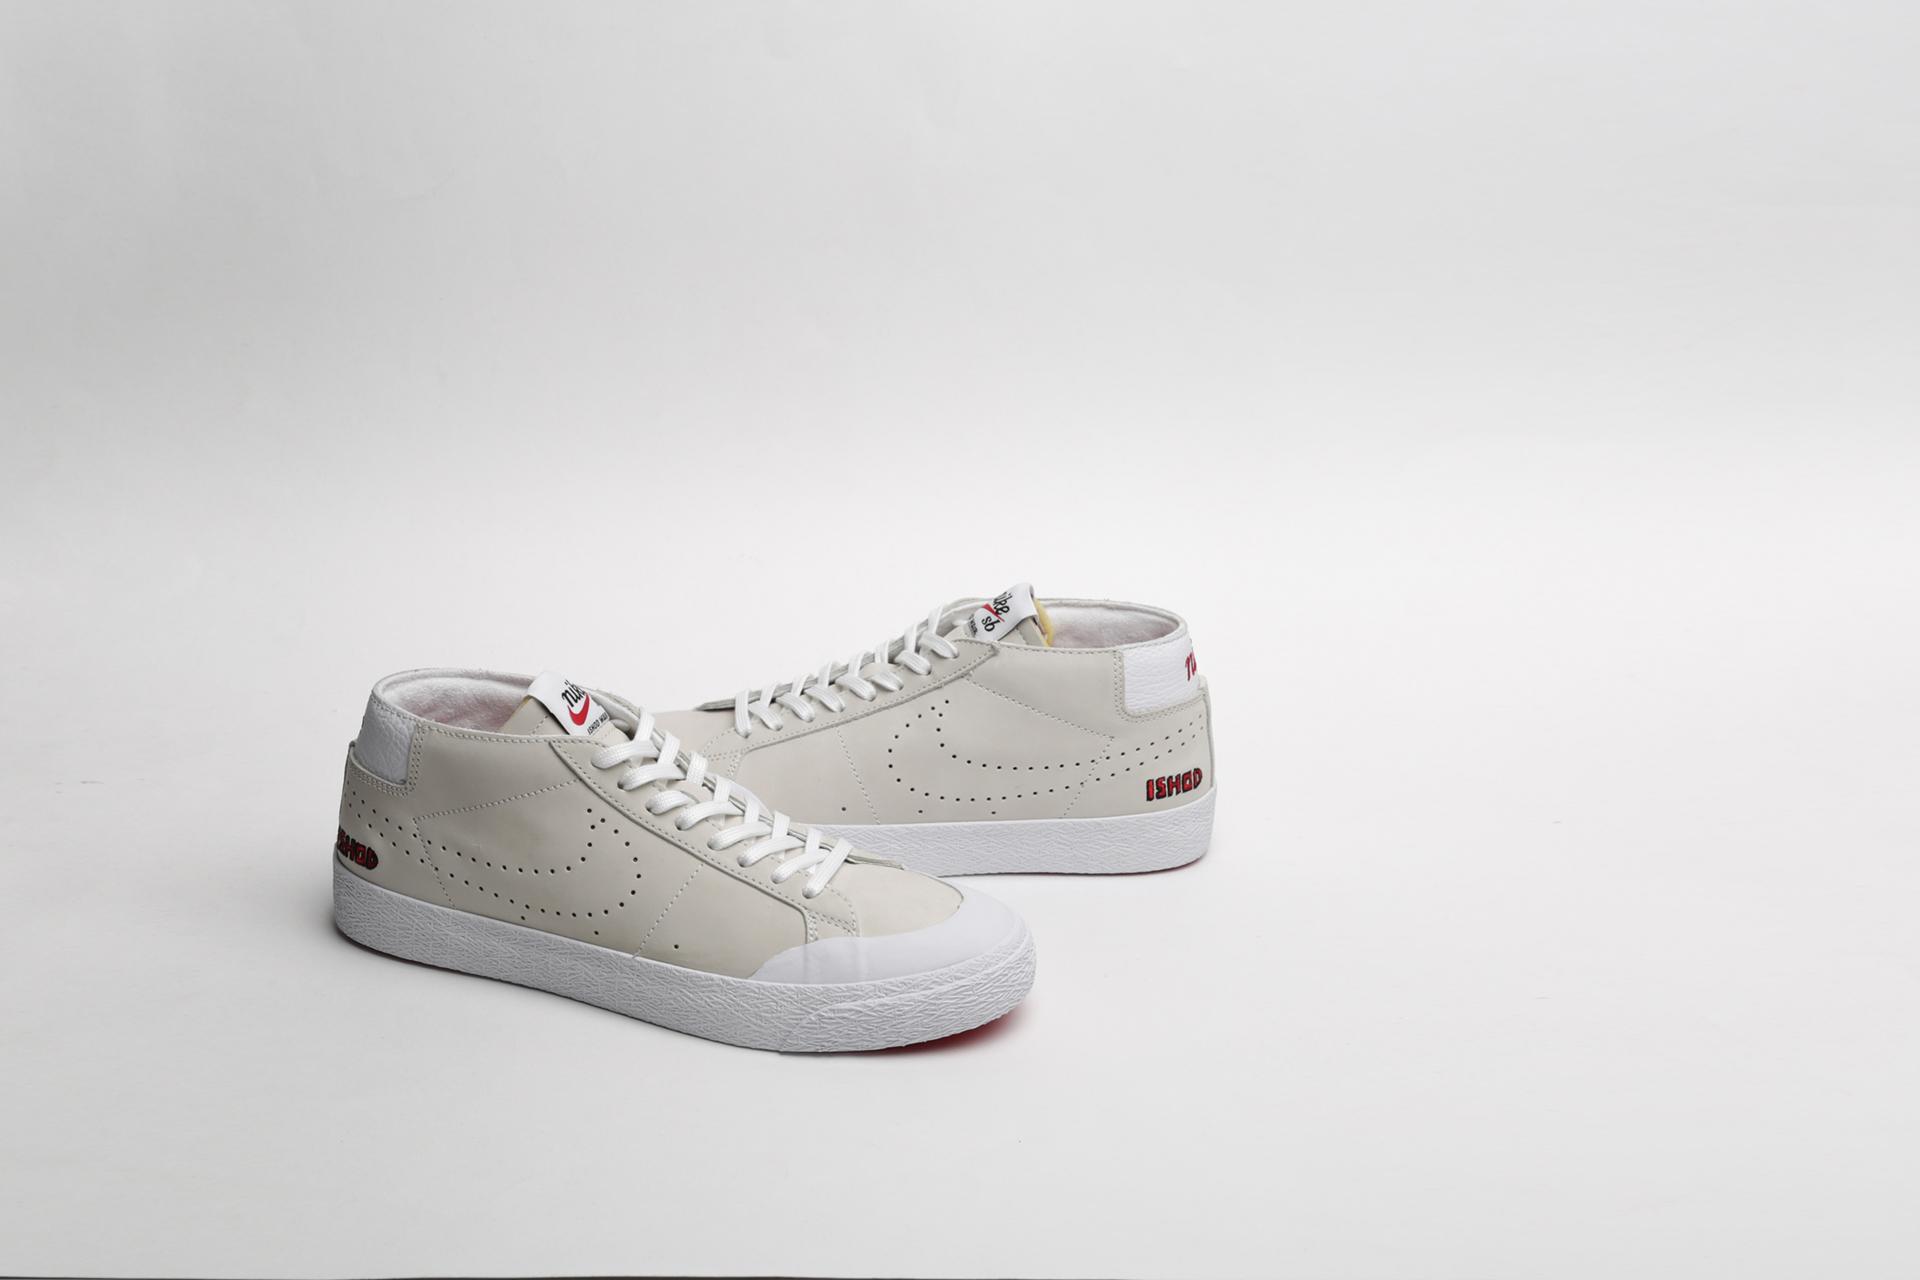 2df9be8519a5 Купить бежевые мужские кроссовки SB Zoom Blazer Chukka XT QS от Nike ...